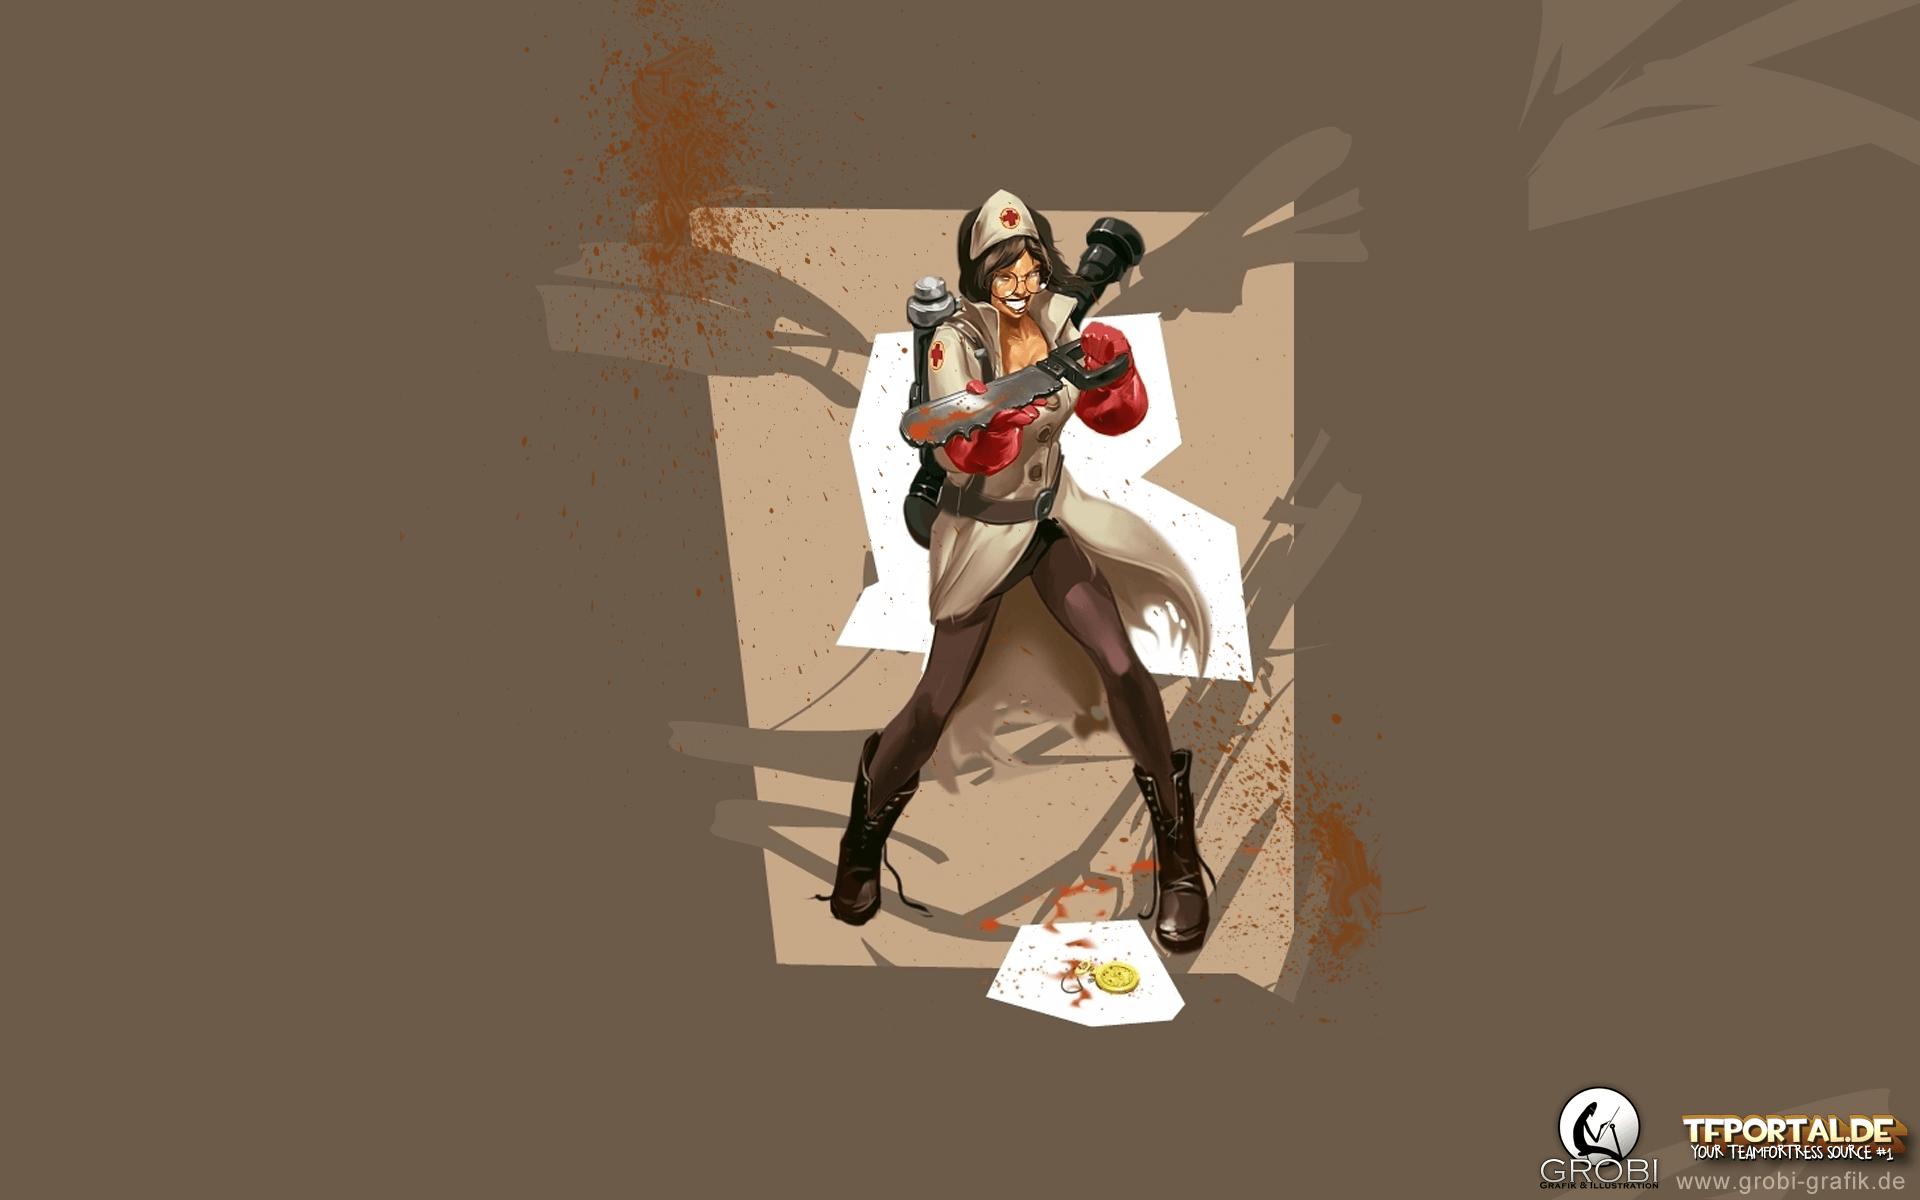 Team Fortress 2 Medic Wallpapers Wallpaper Cave